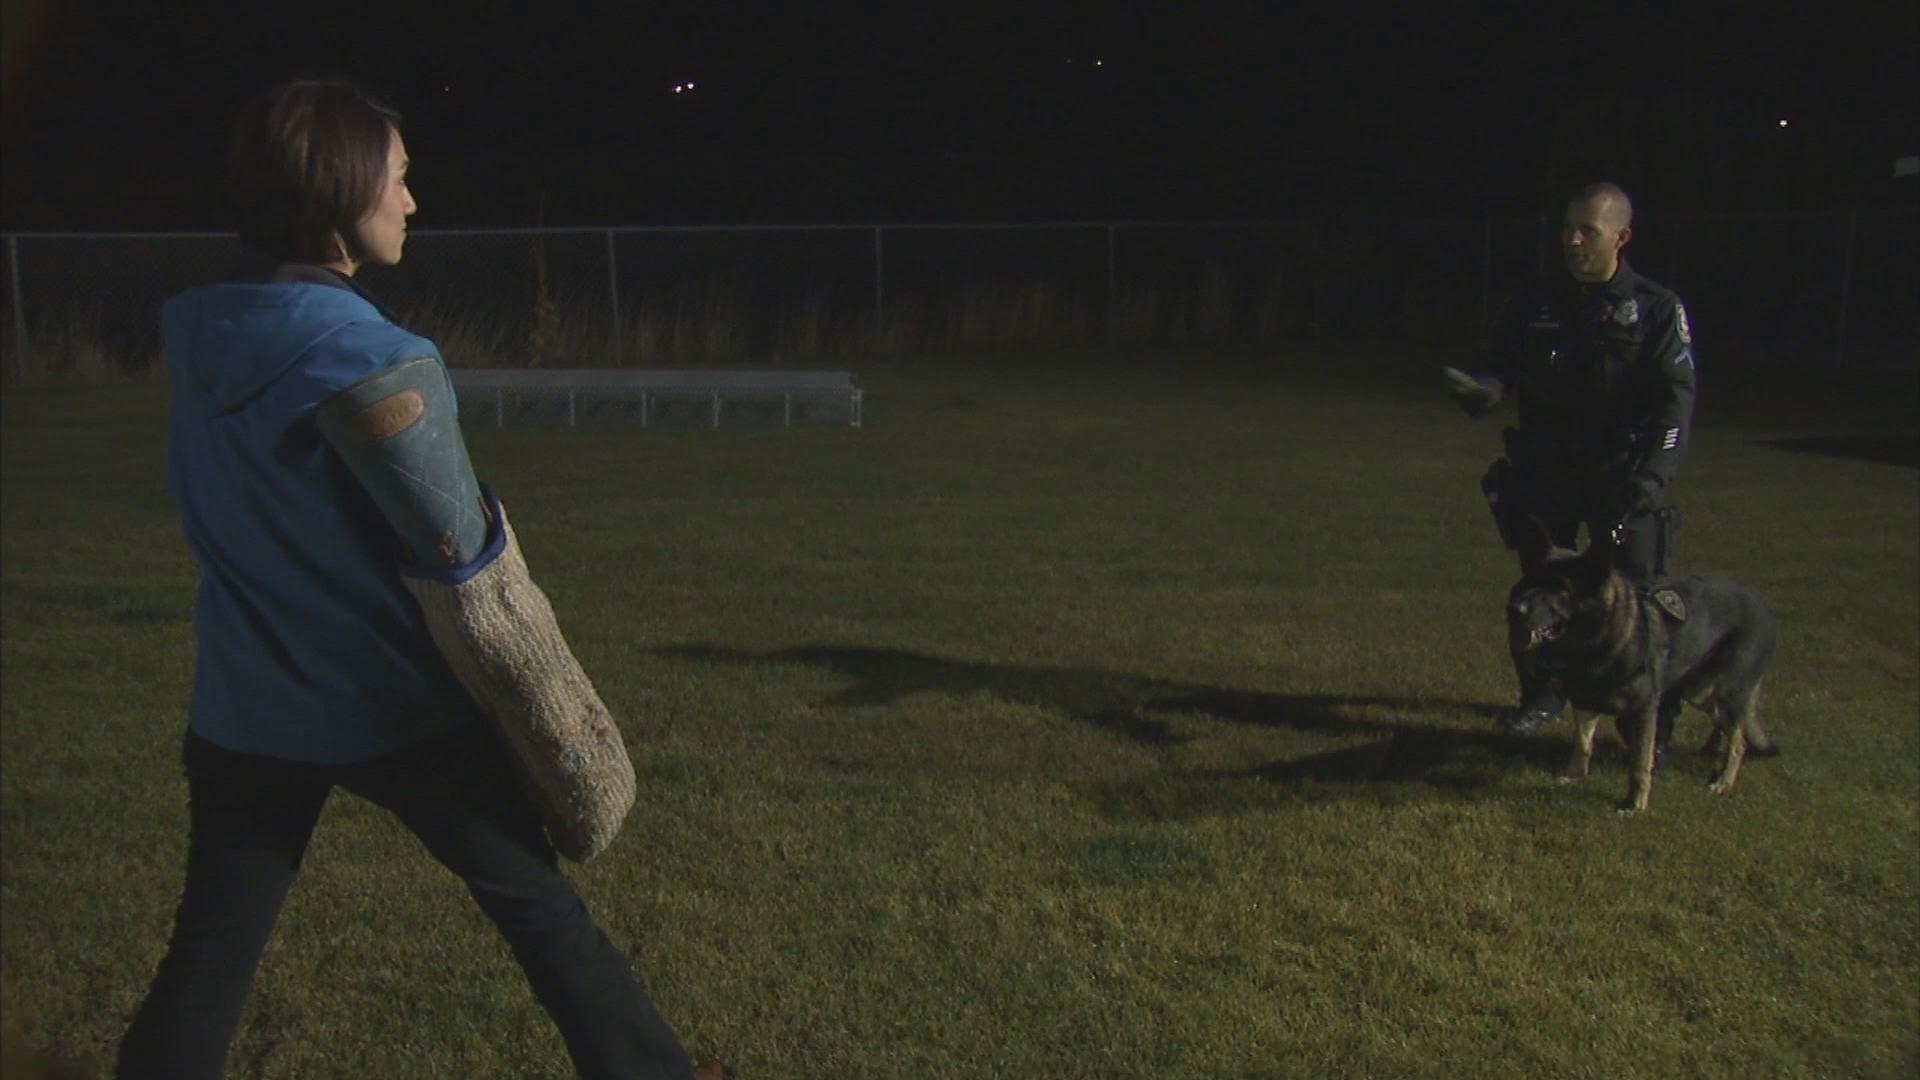 KHQ's Kalae Chock gets ready take on Talon from the Spokane Police Department's K9 Unit